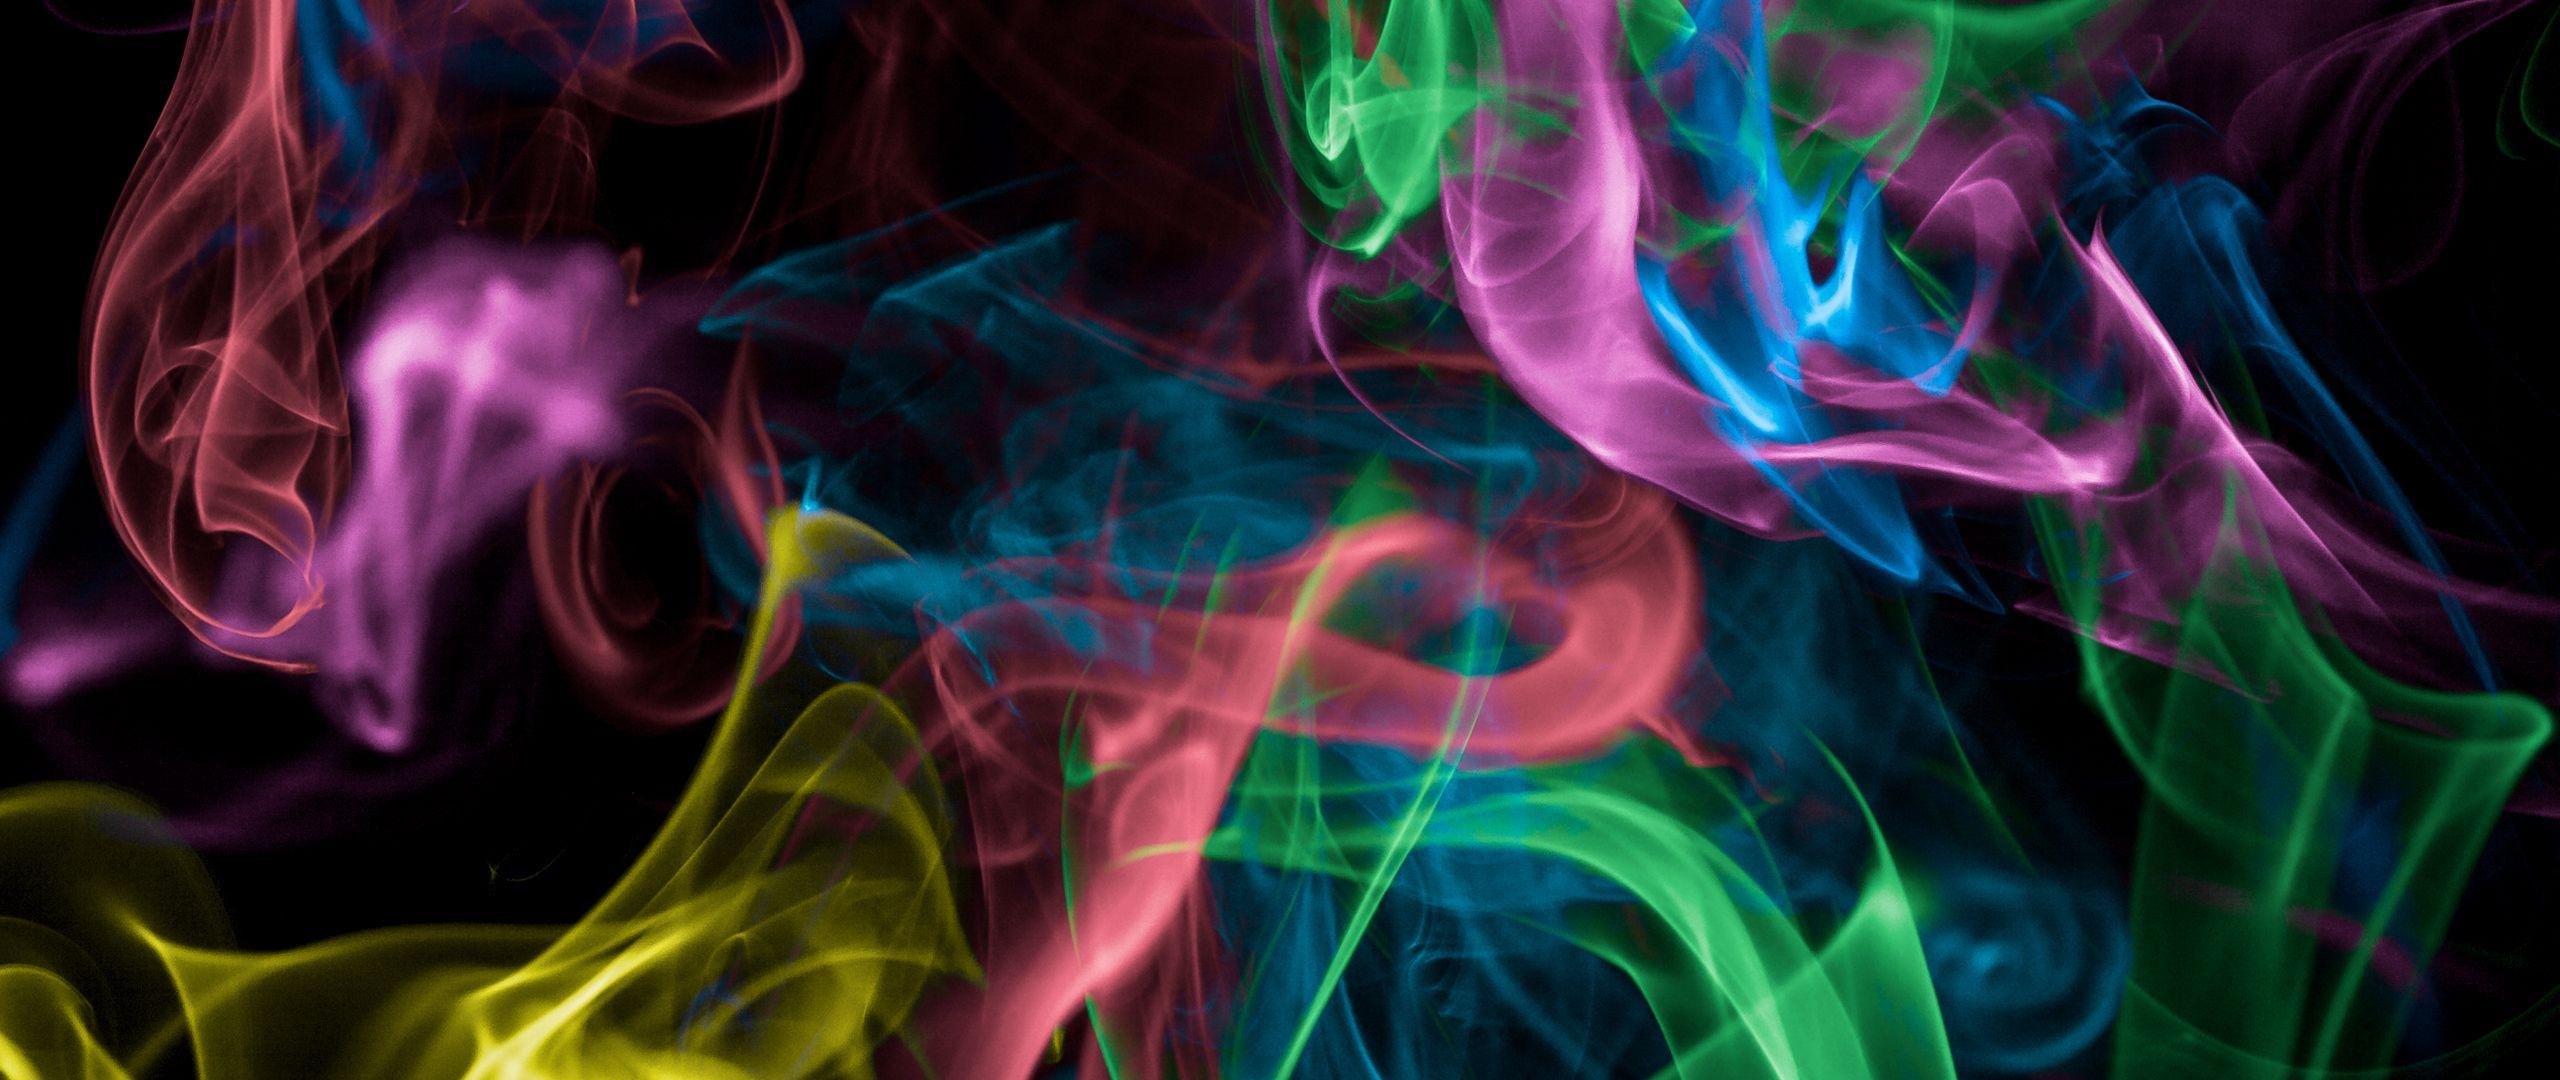 Fondos de pantalla Humo colorido